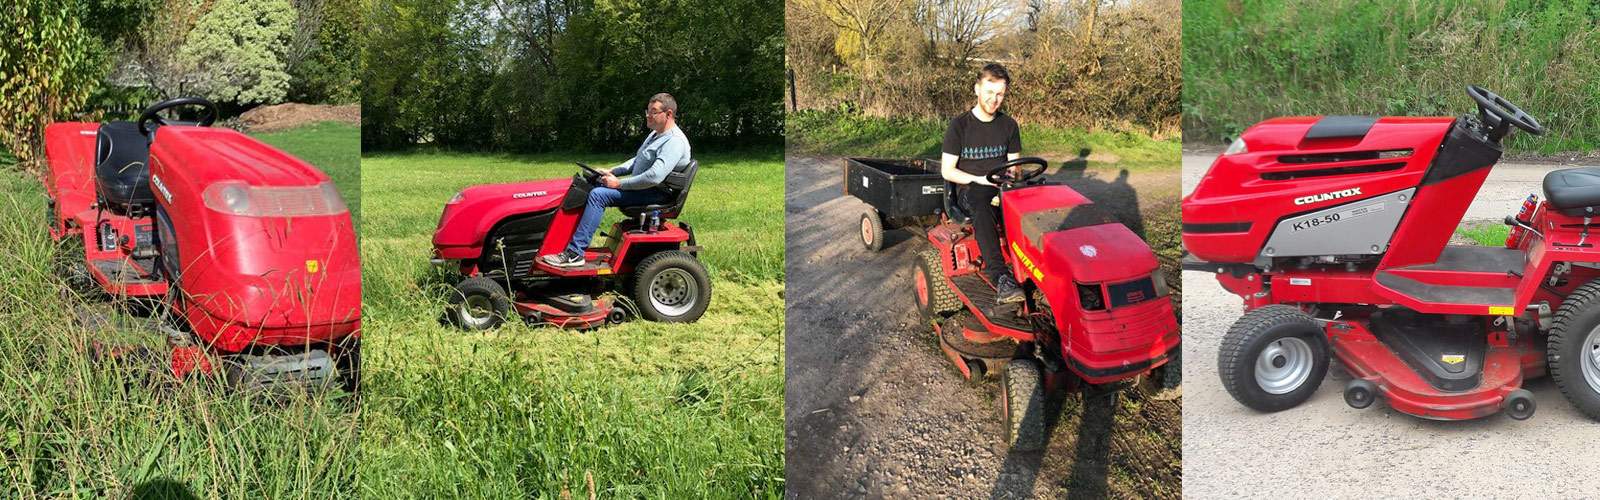 Countax garden tractor owner testimonials